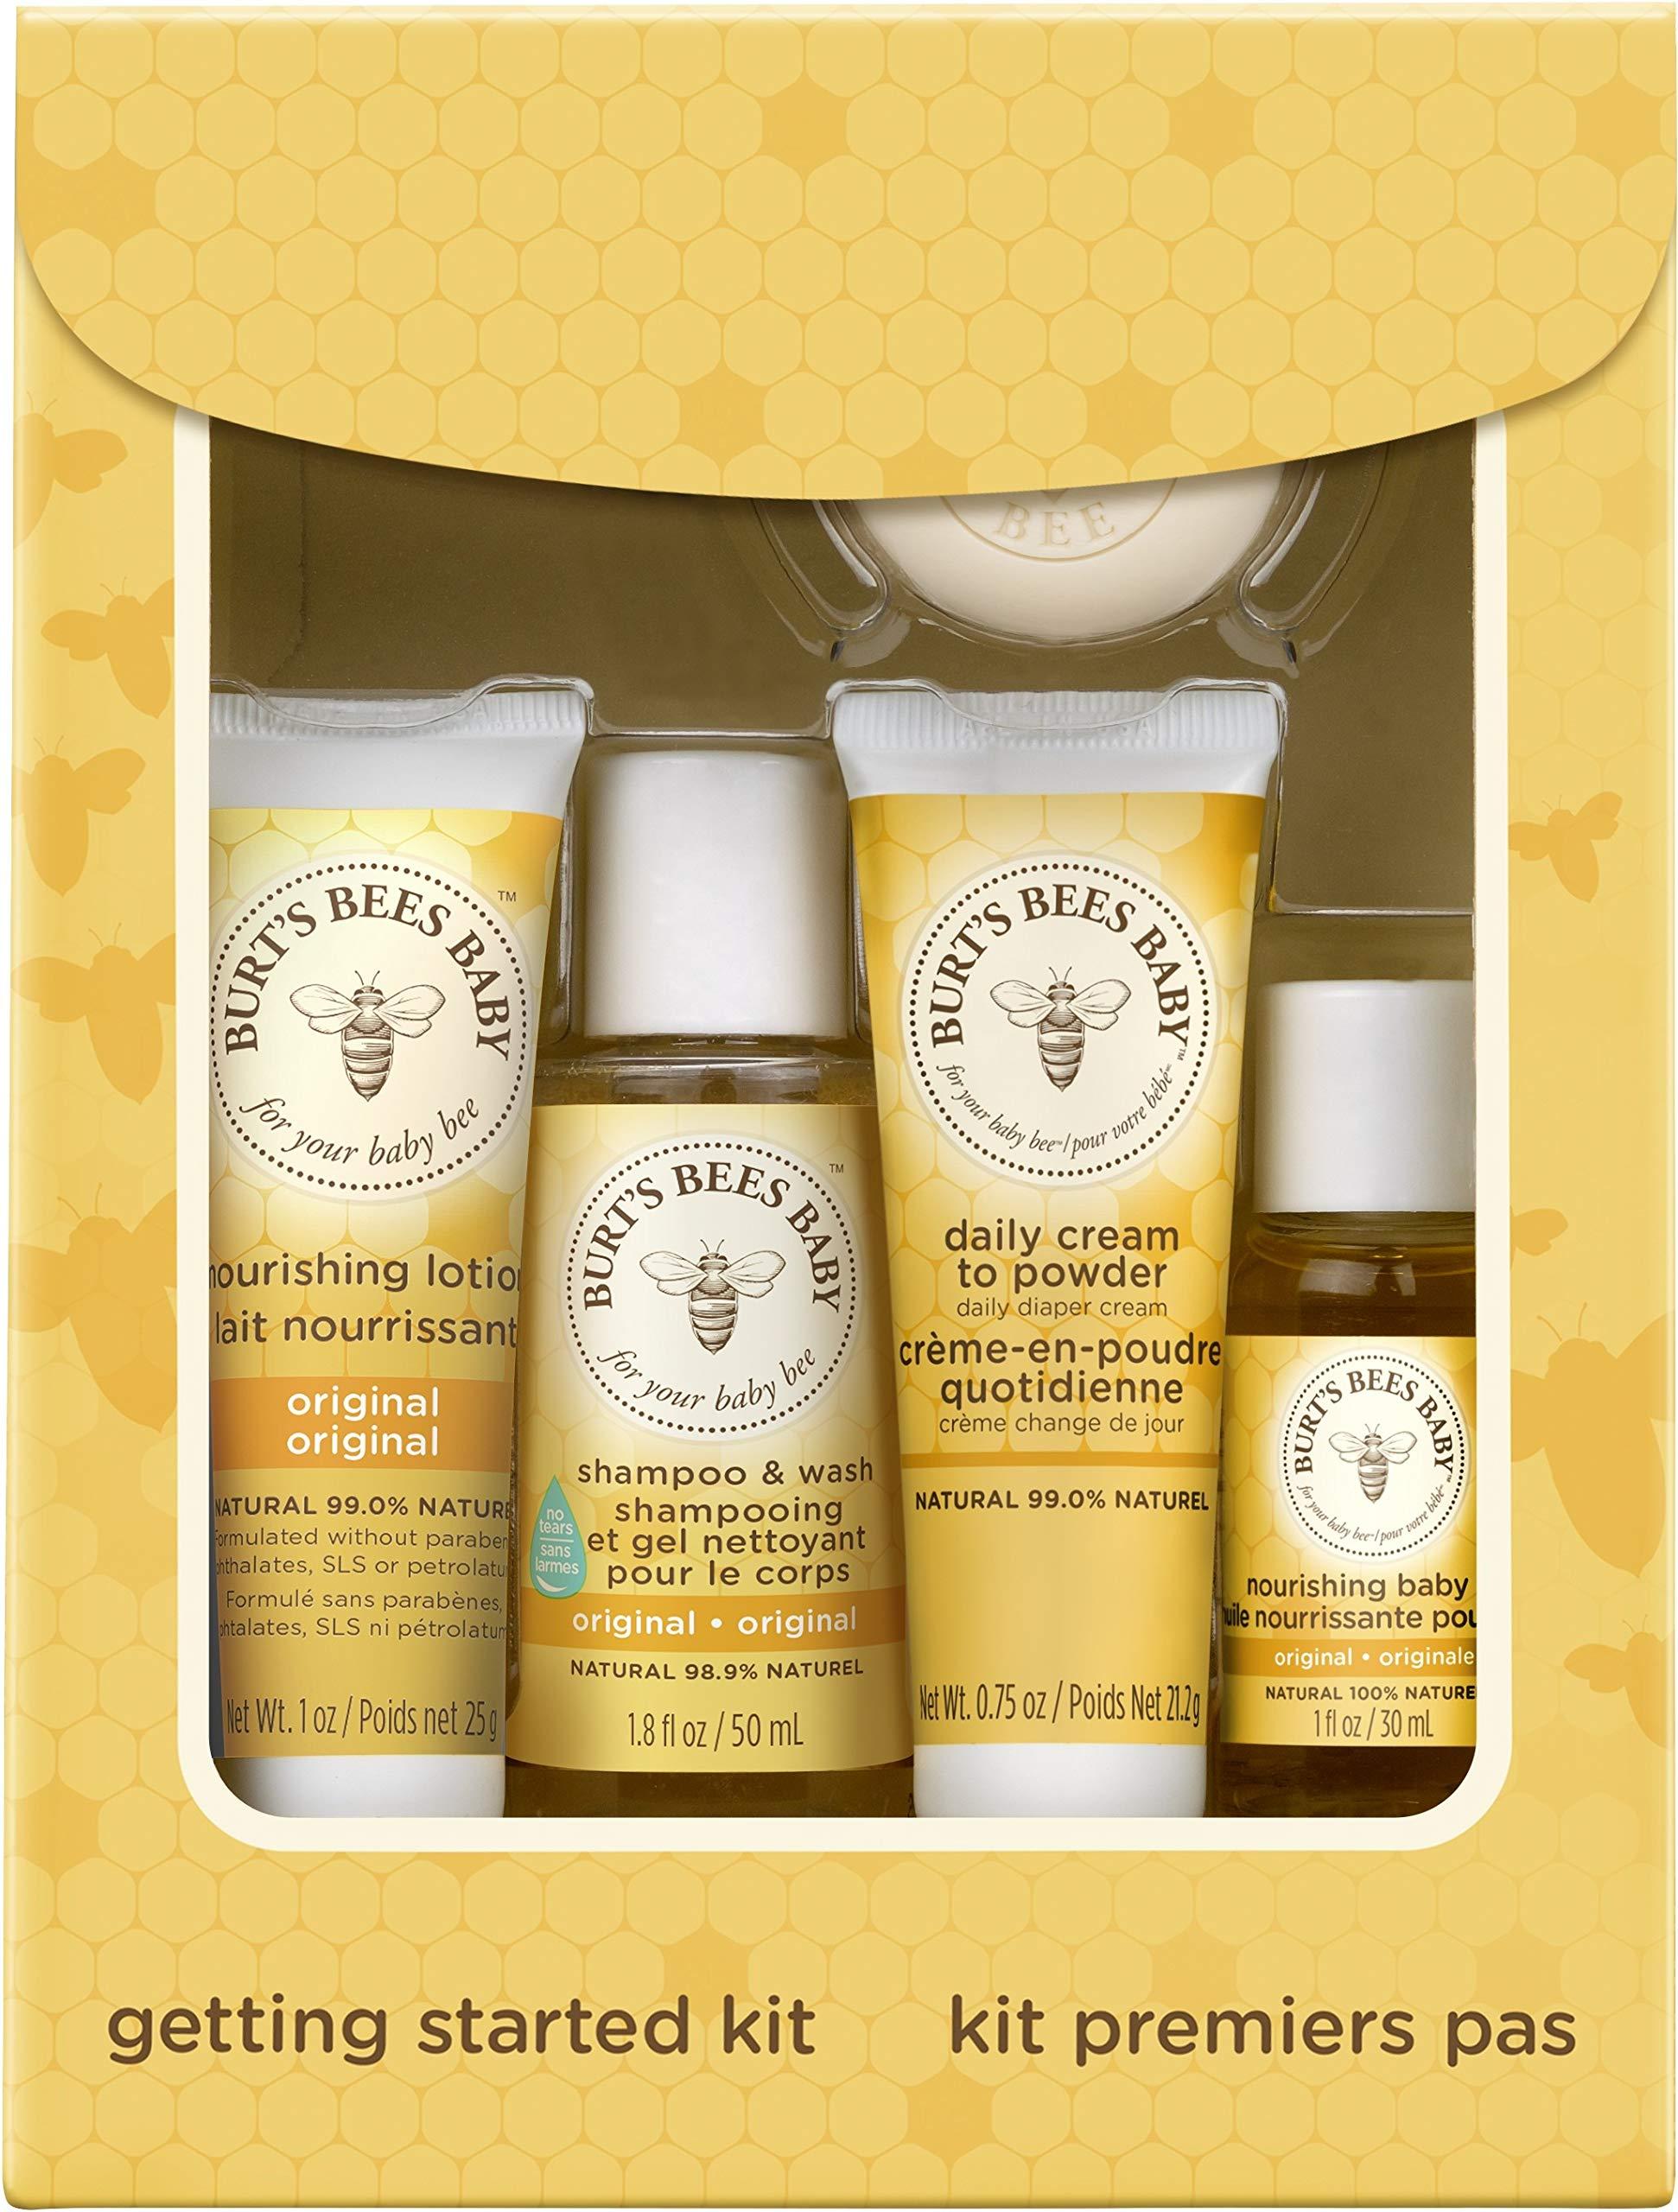 Burt's Bees Burt's Bees Baby Getting Started礼盒套装,5个试用装婴儿护肤品 - 乳液,洗发沐浴露,日霜,婴儿油和肥皂